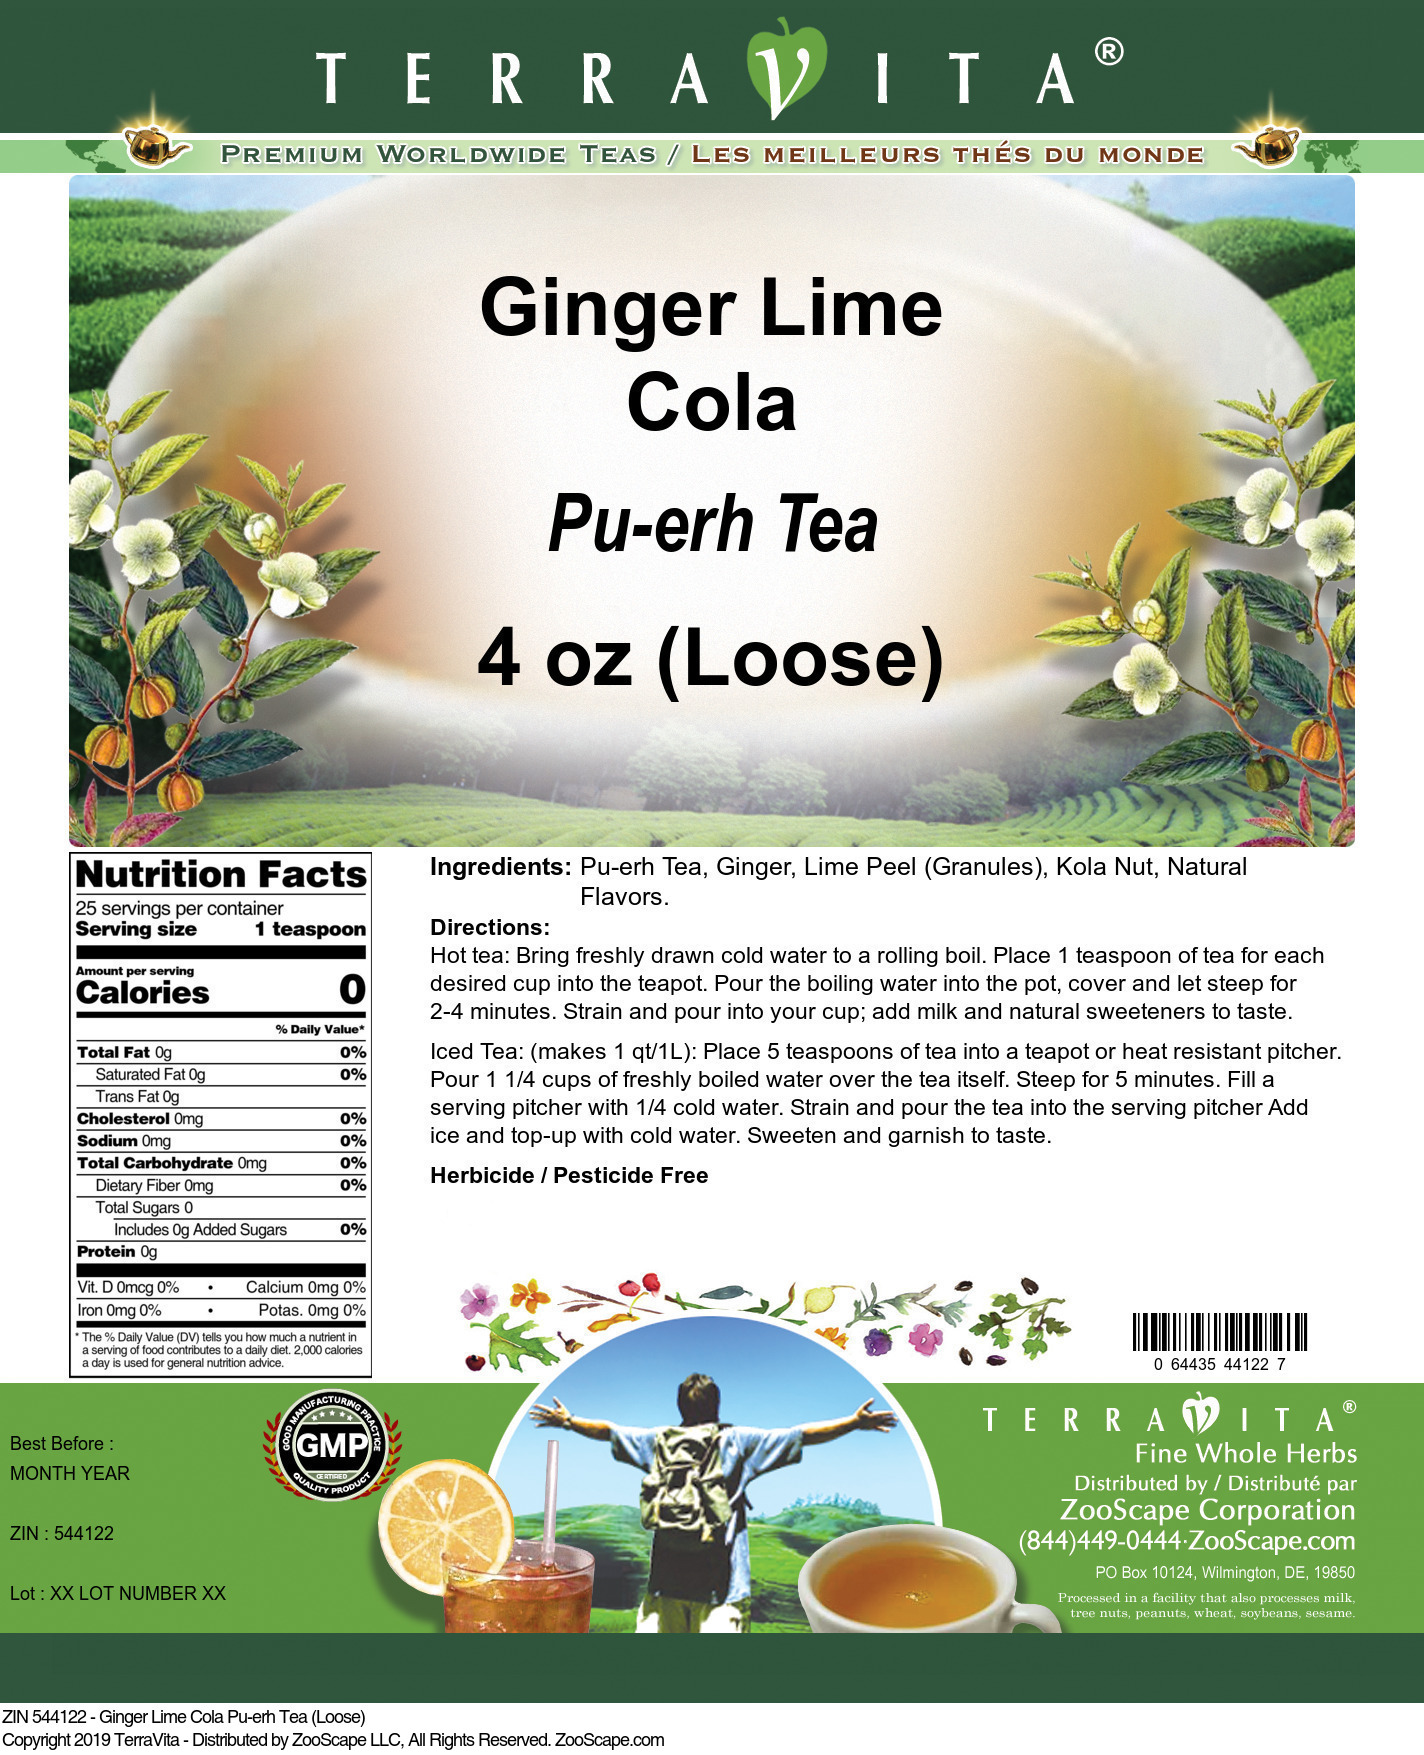 Ginger Lime Cola Pu-erh Tea